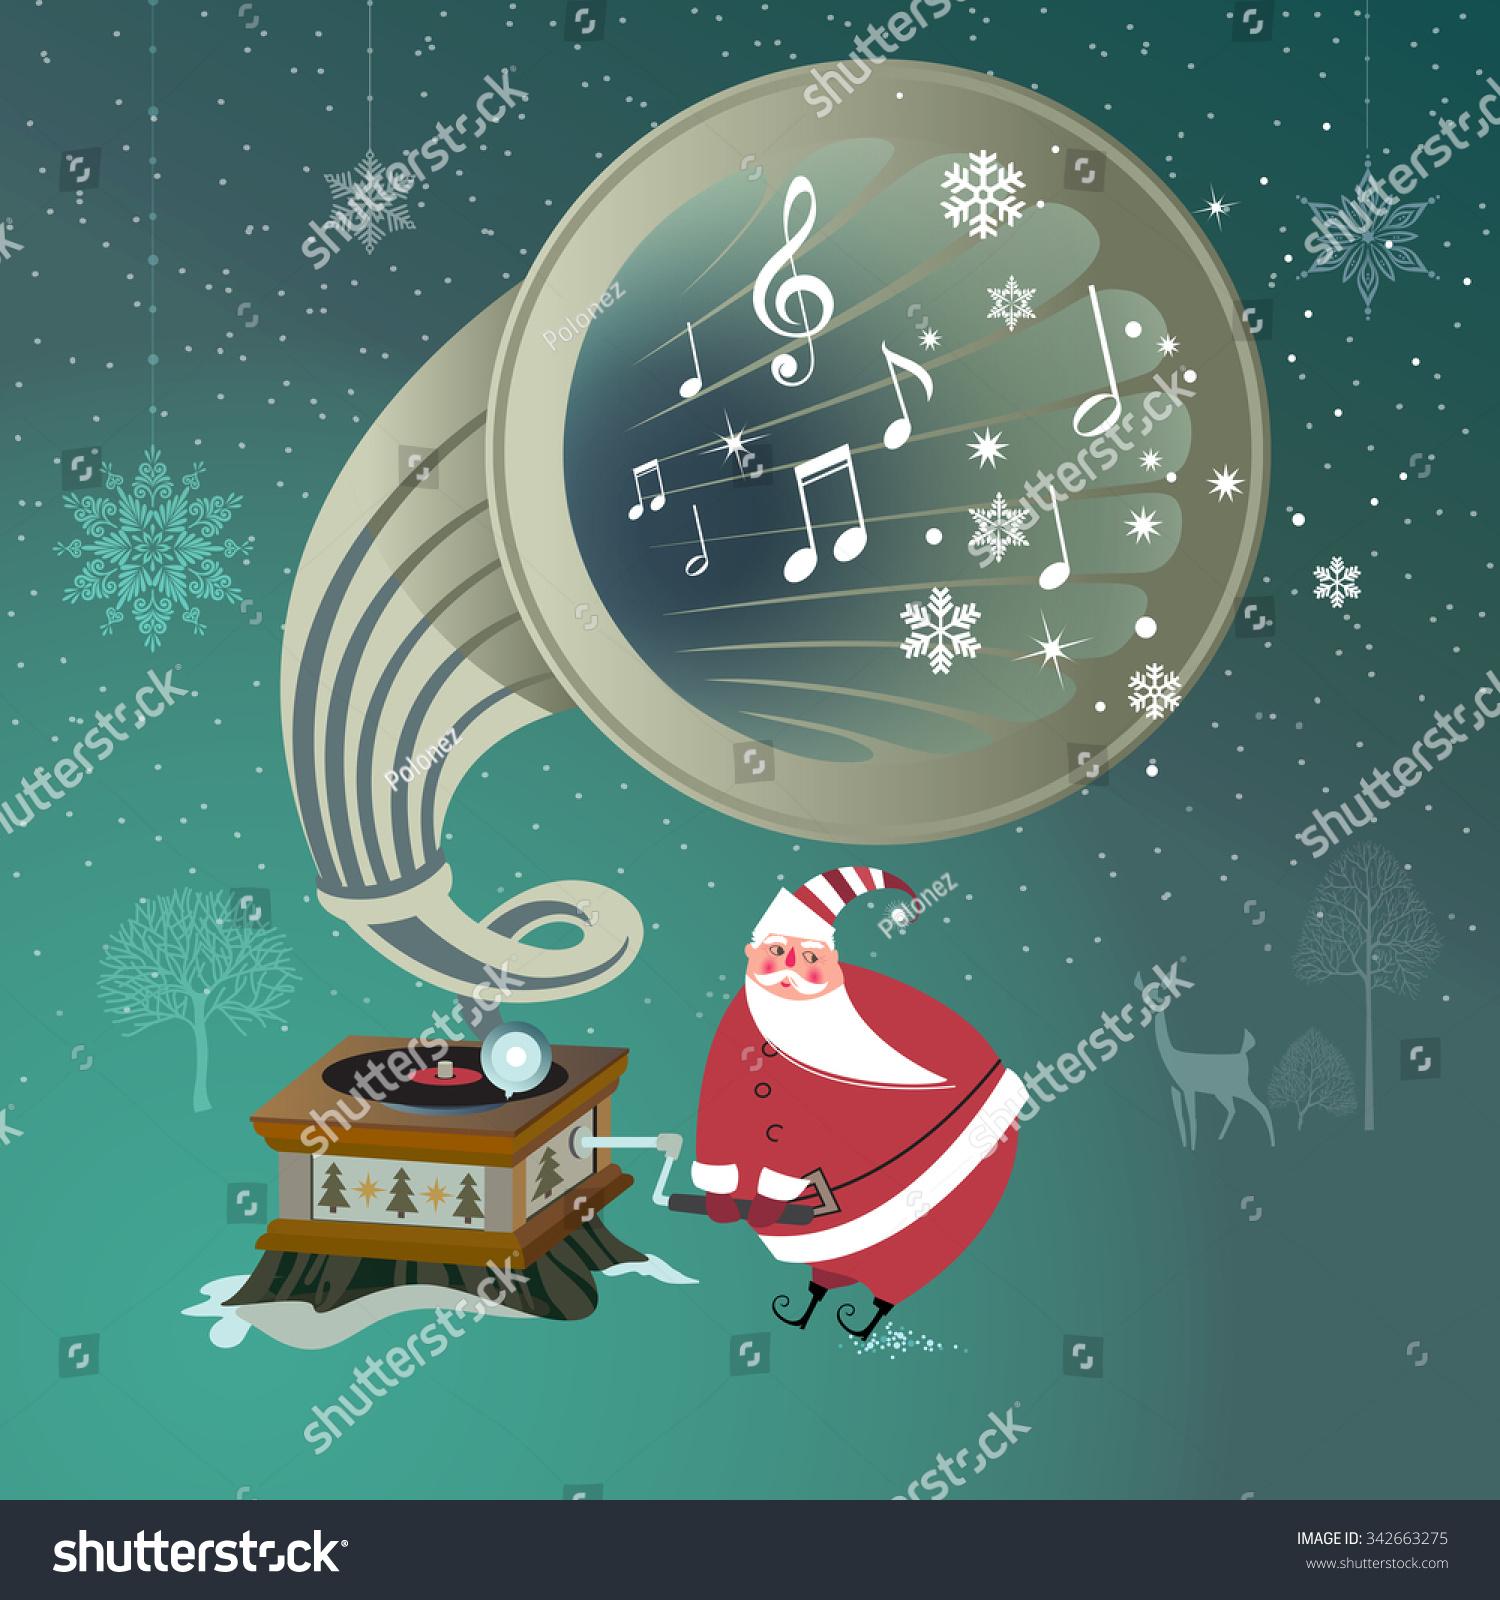 Cute Santa Claus Plays Christmas Music Stock Vector (Royalty Free ...